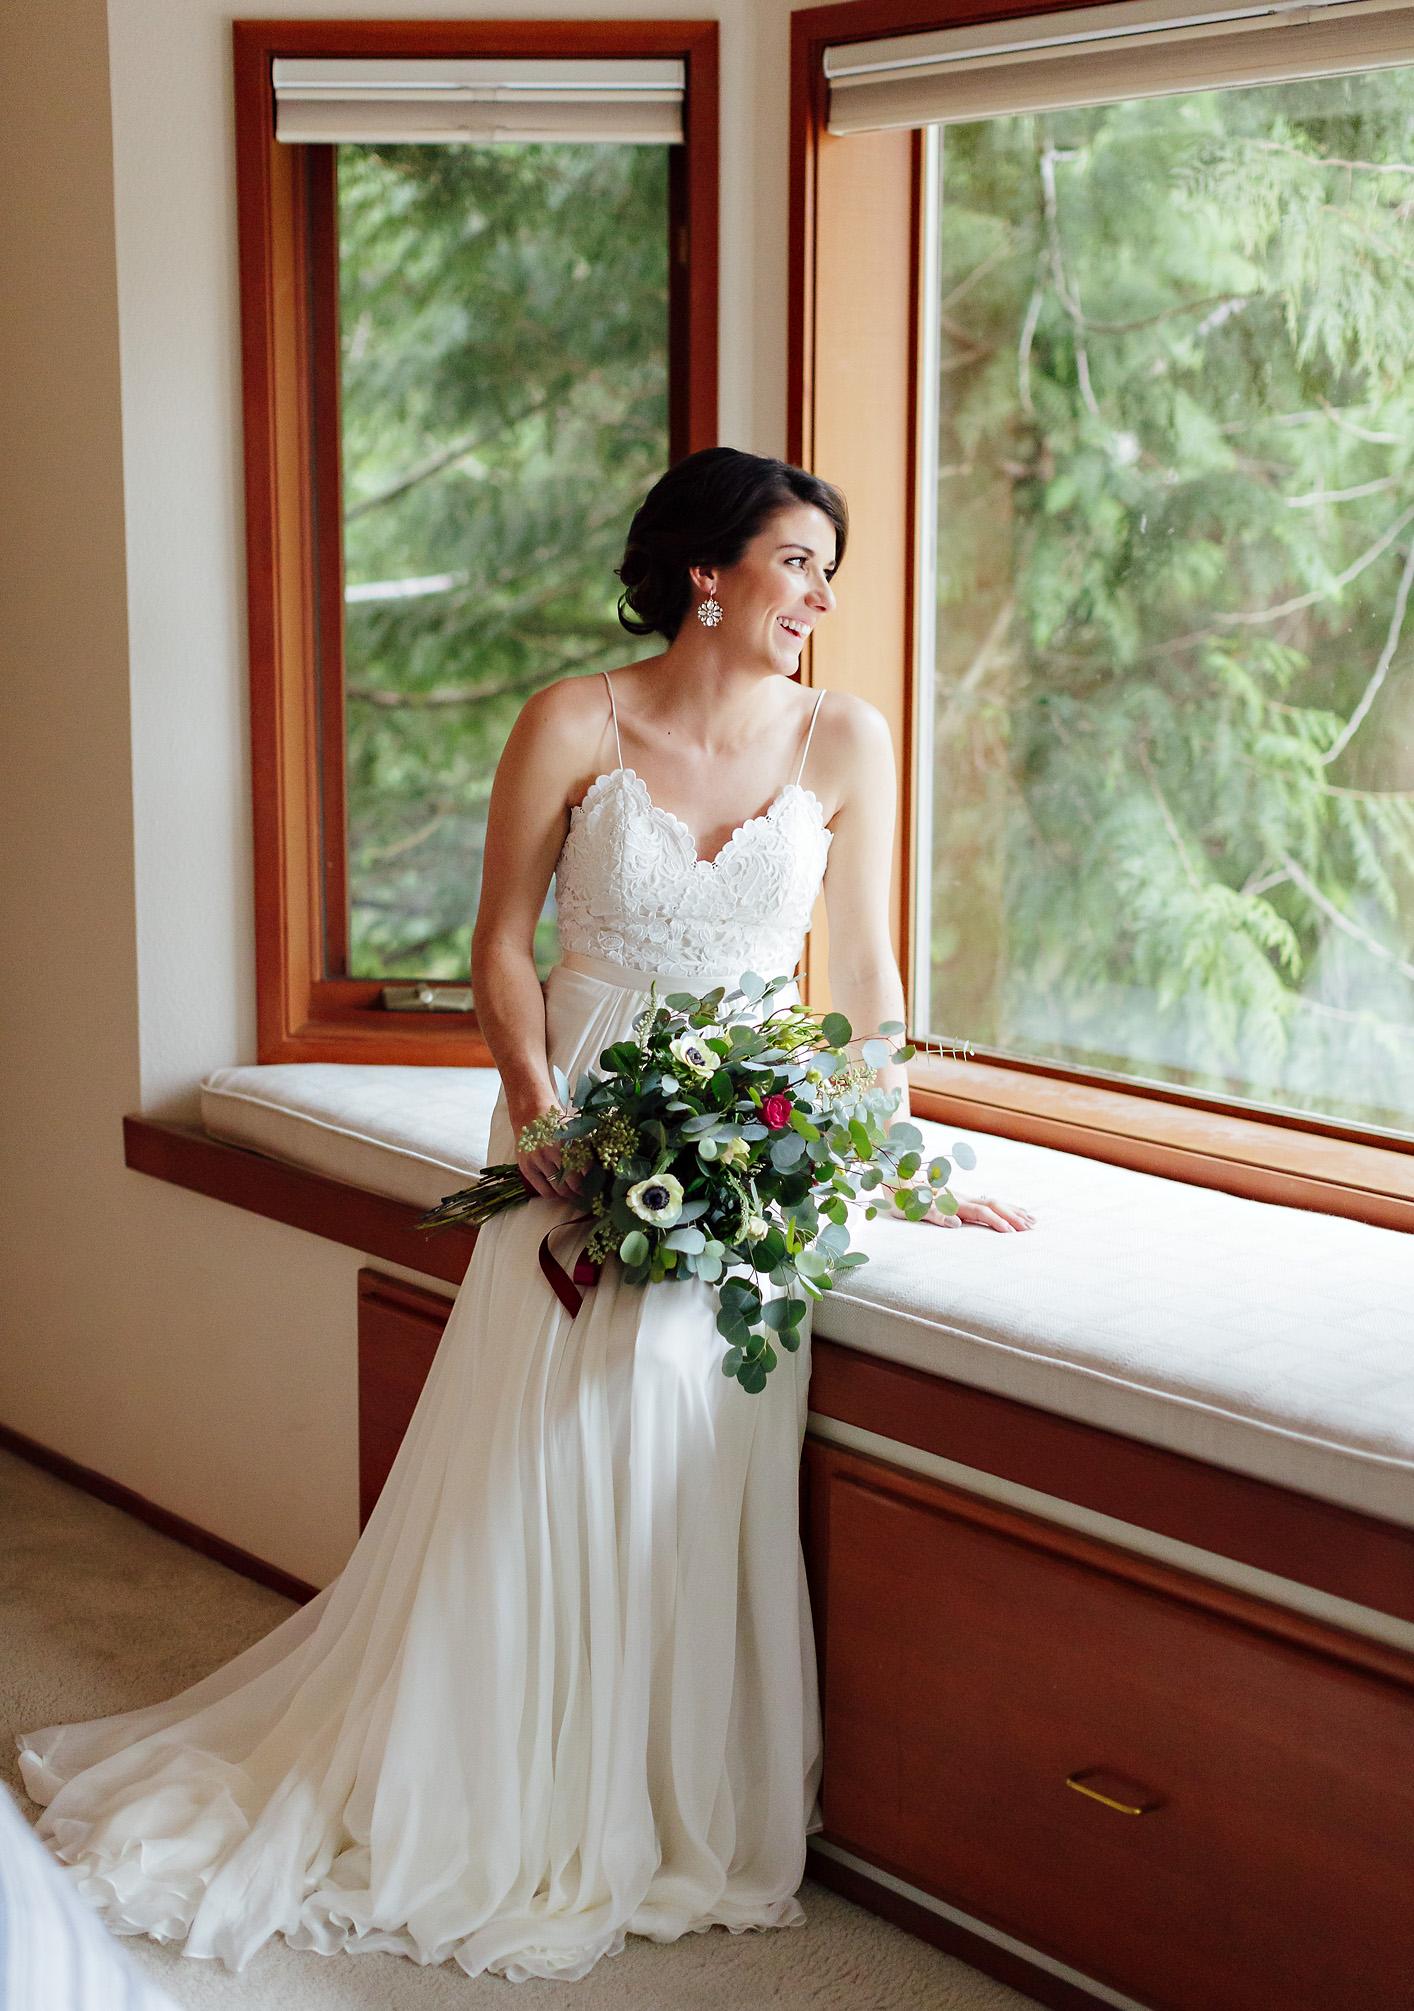 blog sarah postma photography meaningful real wedding